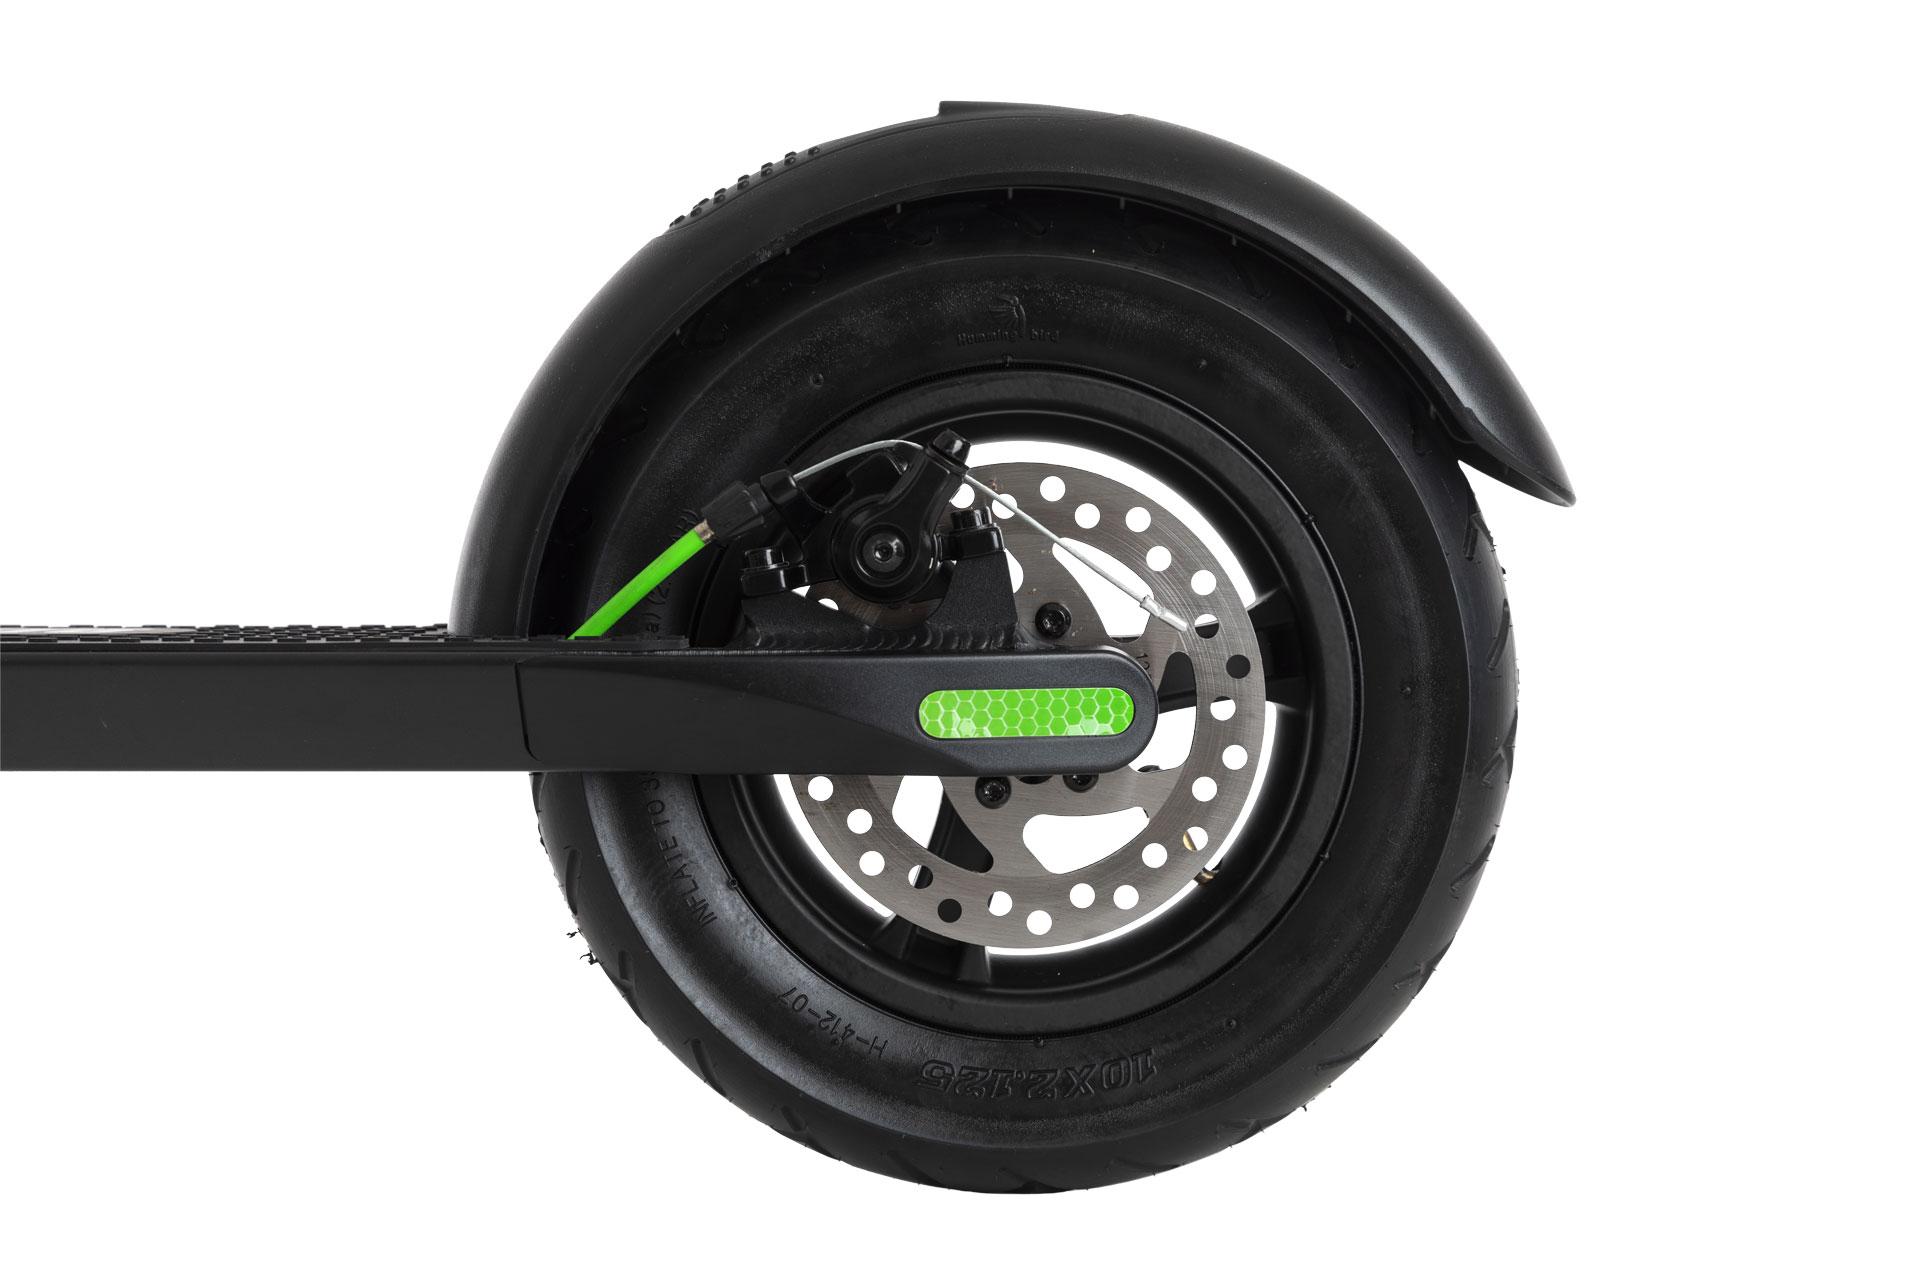 Beat monopattino verde ruota con freno a disco